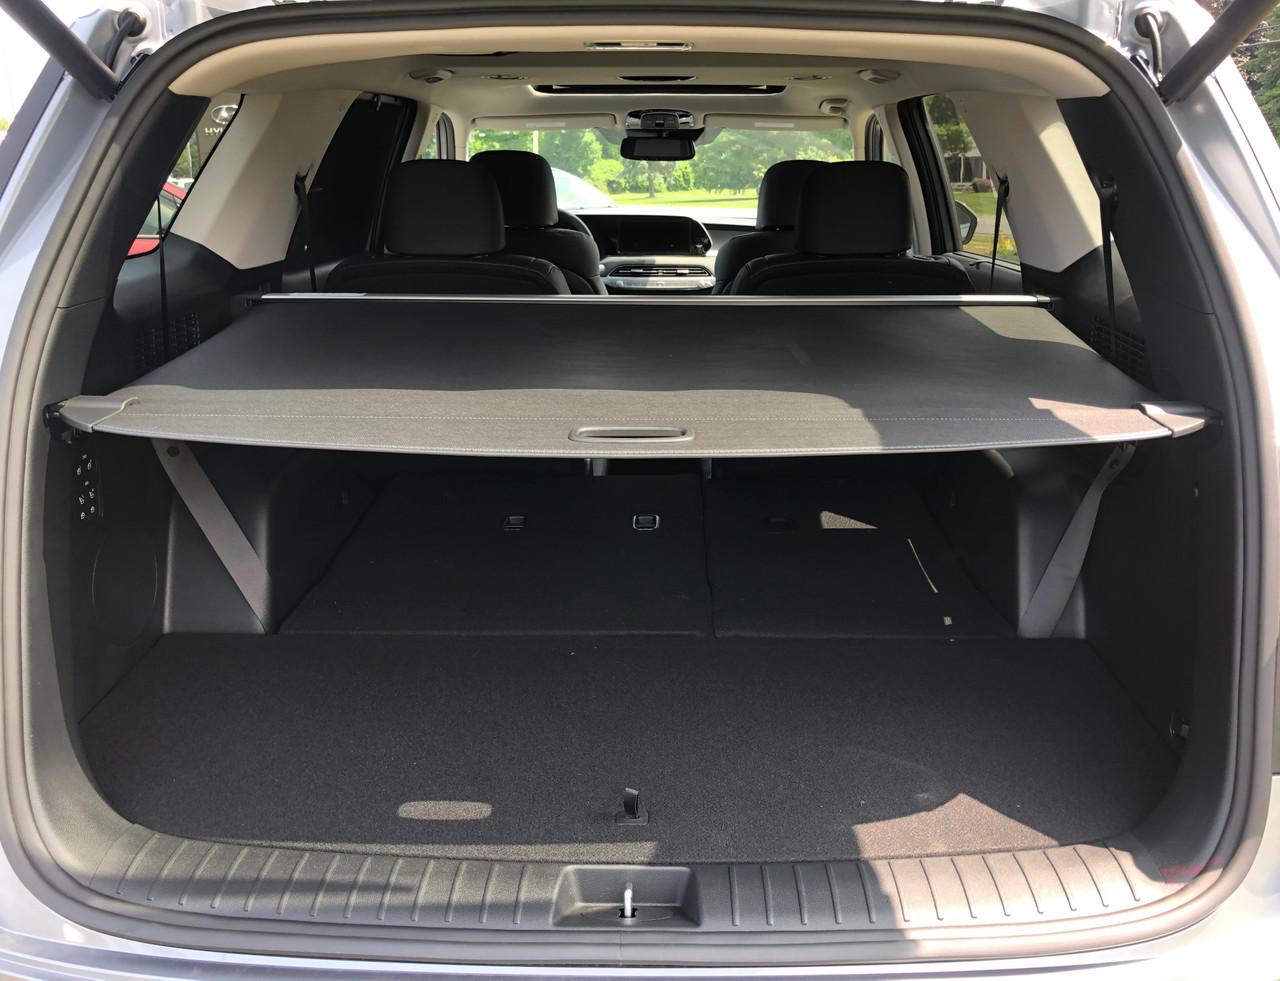 2020 Hyundai Palisade oem Cargo Net